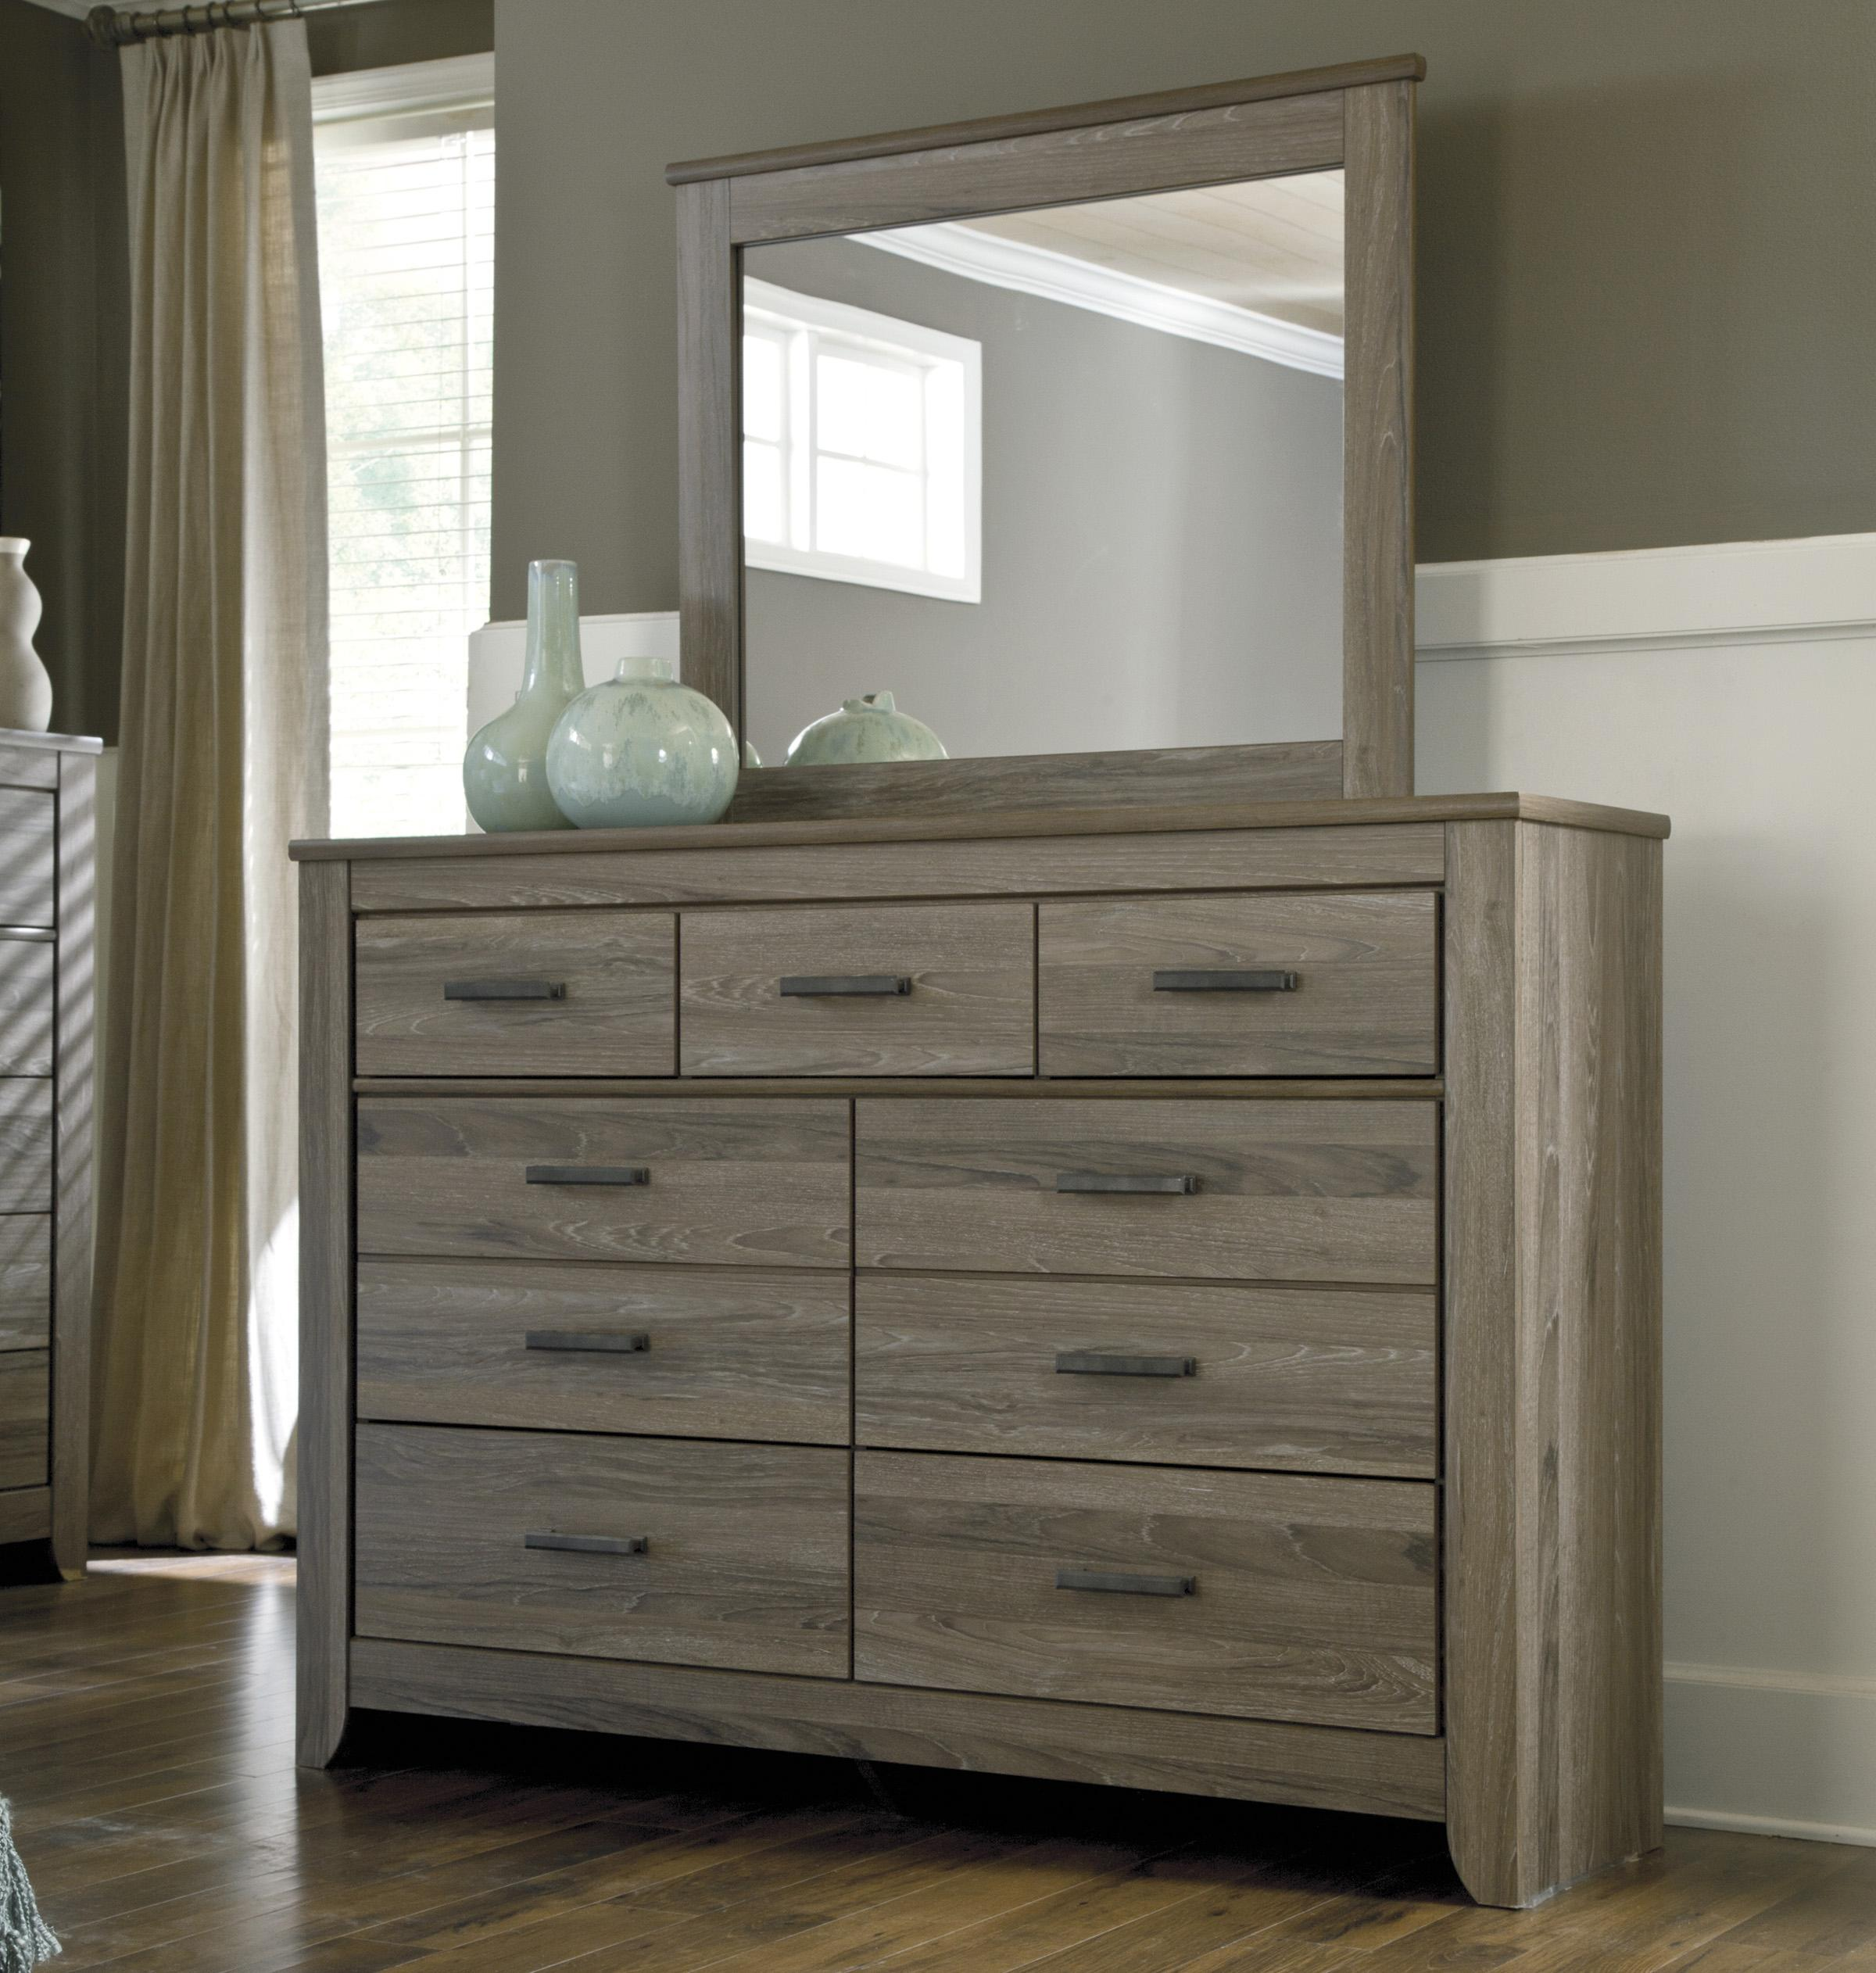 Ashley Signature Design Zelen Rustic Tall Dresser Bedroom Mirror Johnny Janosik Dresser